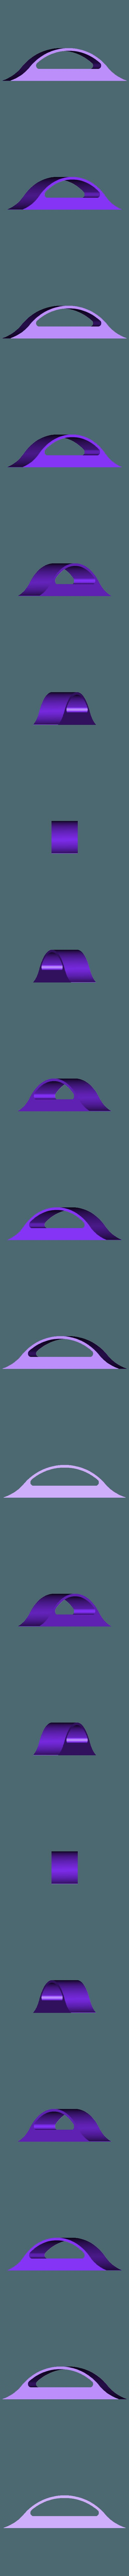 bosse h30 mobile SCX24.STL Download STL file Axial SCX24  RC crawler cross axle track • 3D printable template, lulu3Dbuilder